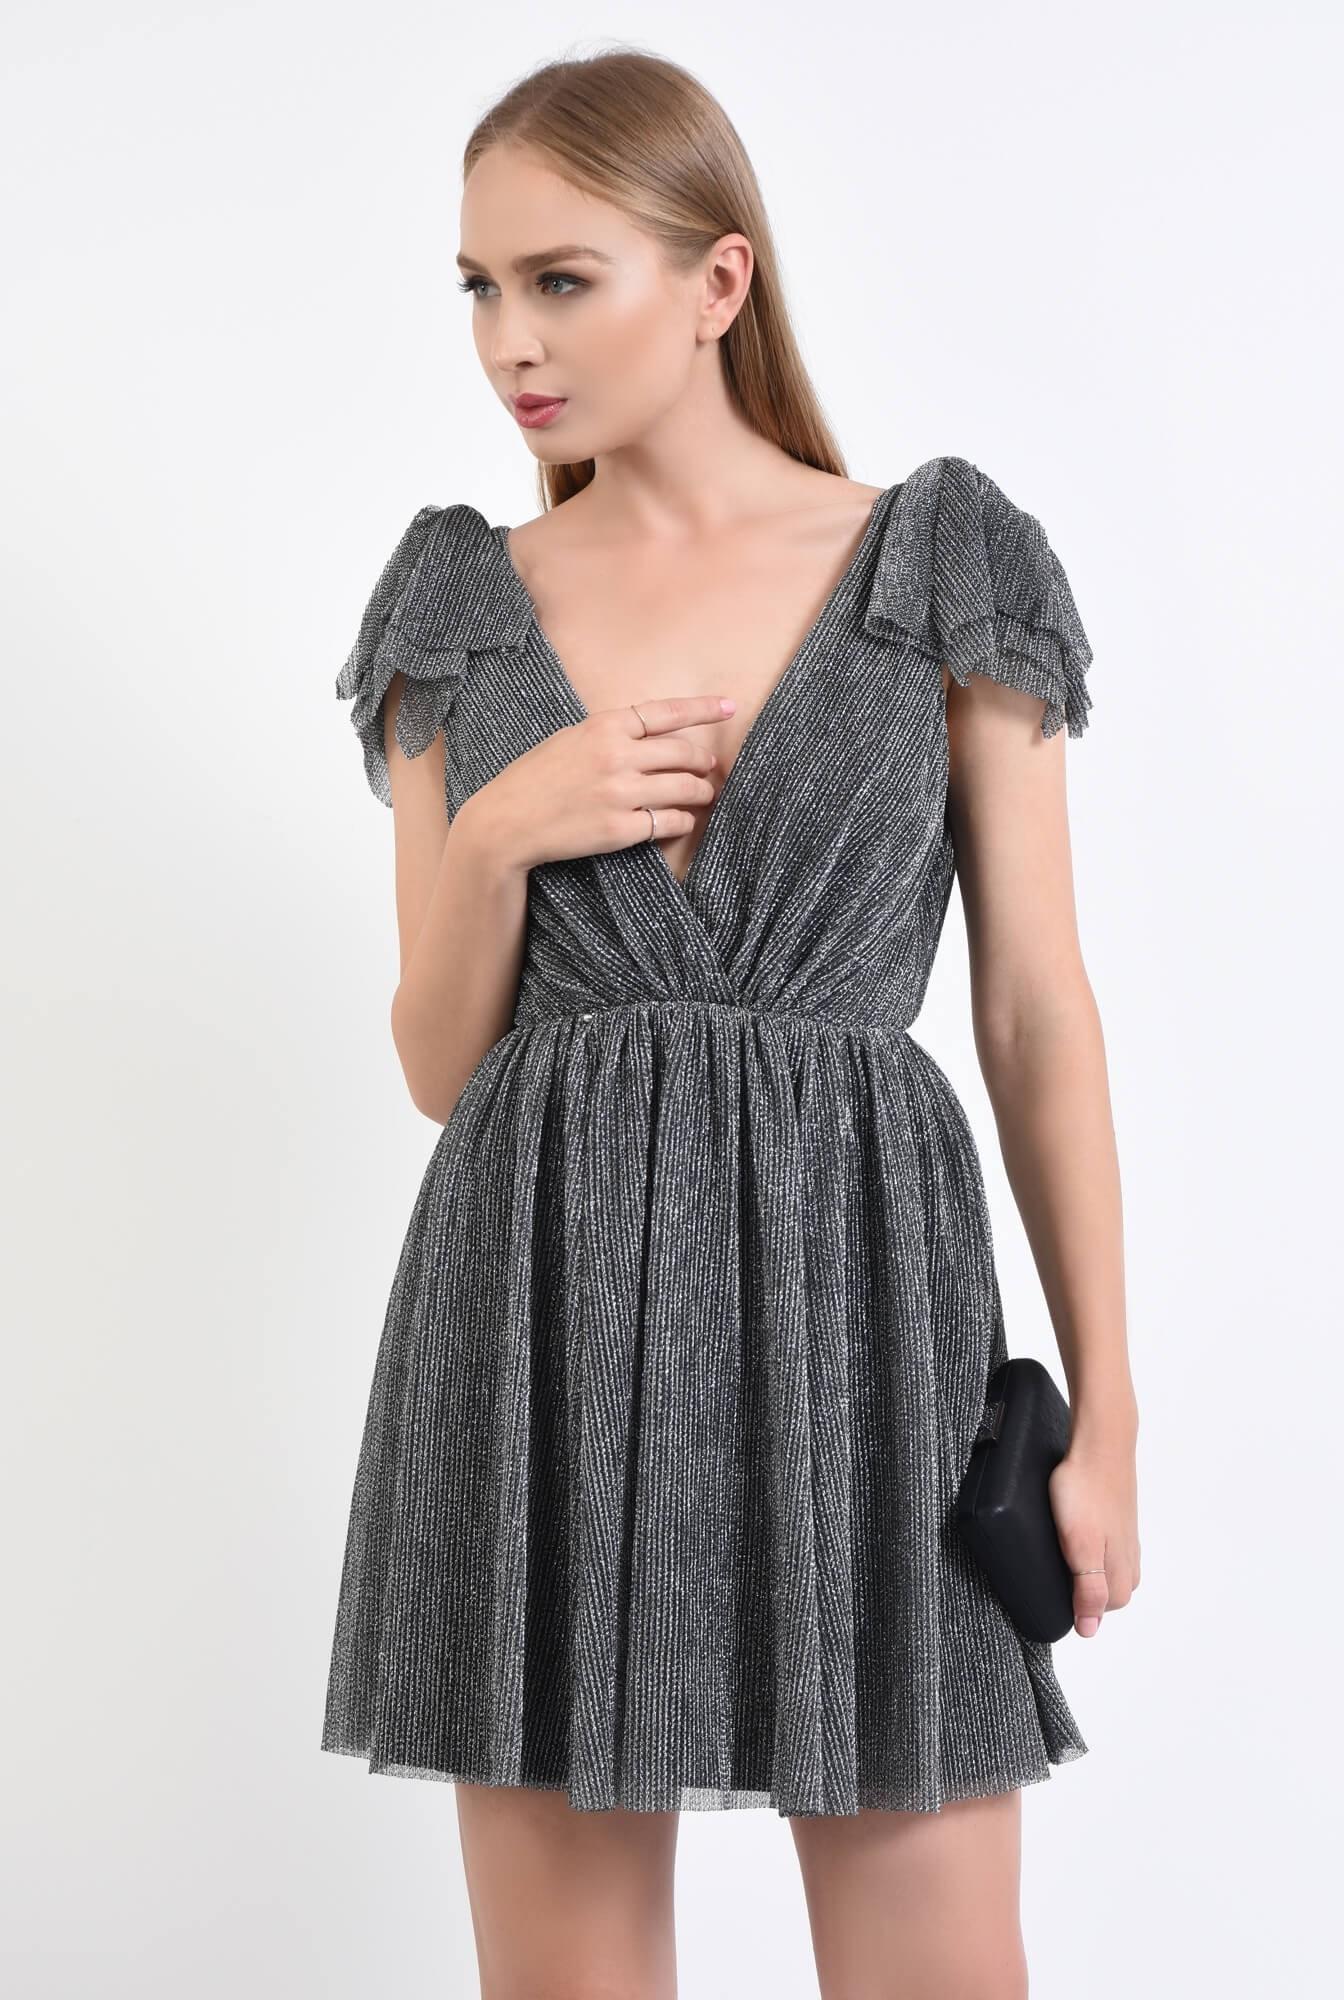 3 - rochie de ocazie, argintiu, negru, lurex, funde